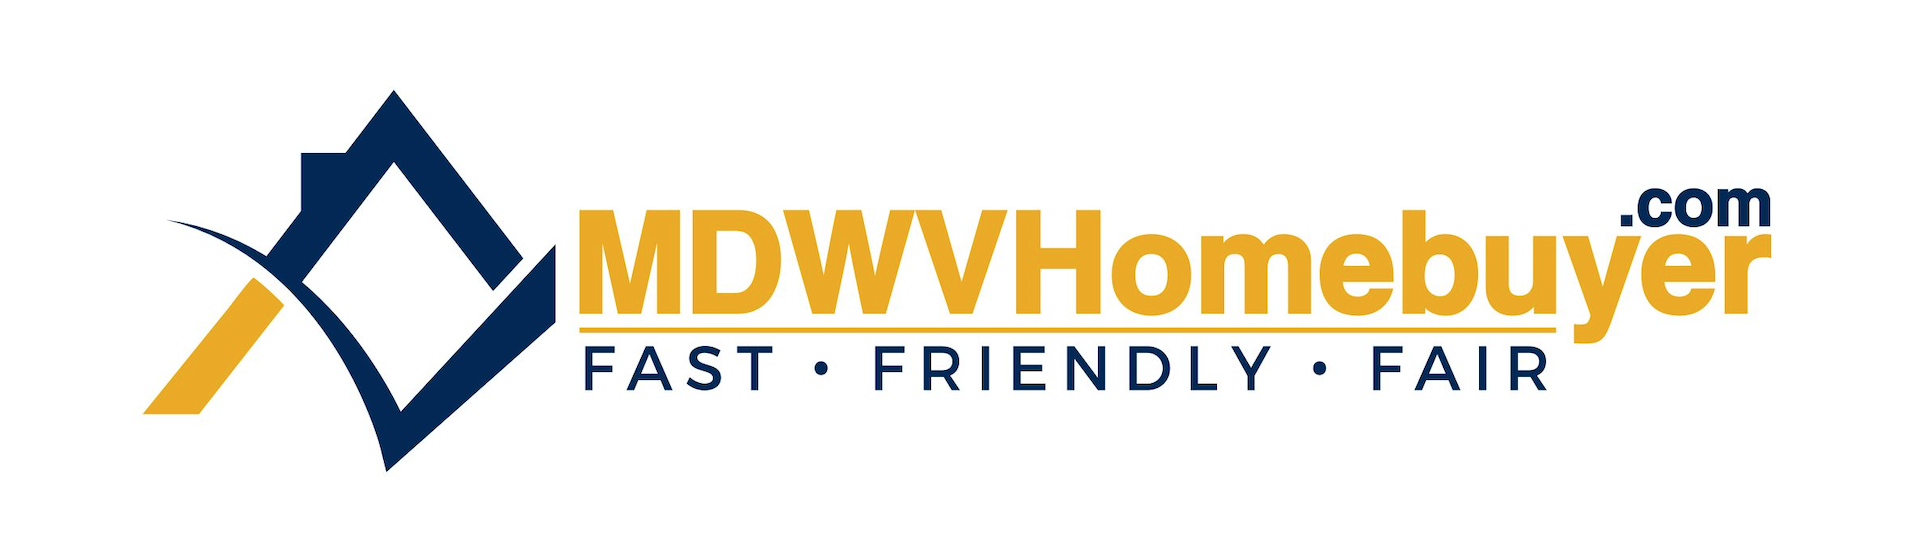 MDWVHomebuyer.com logo